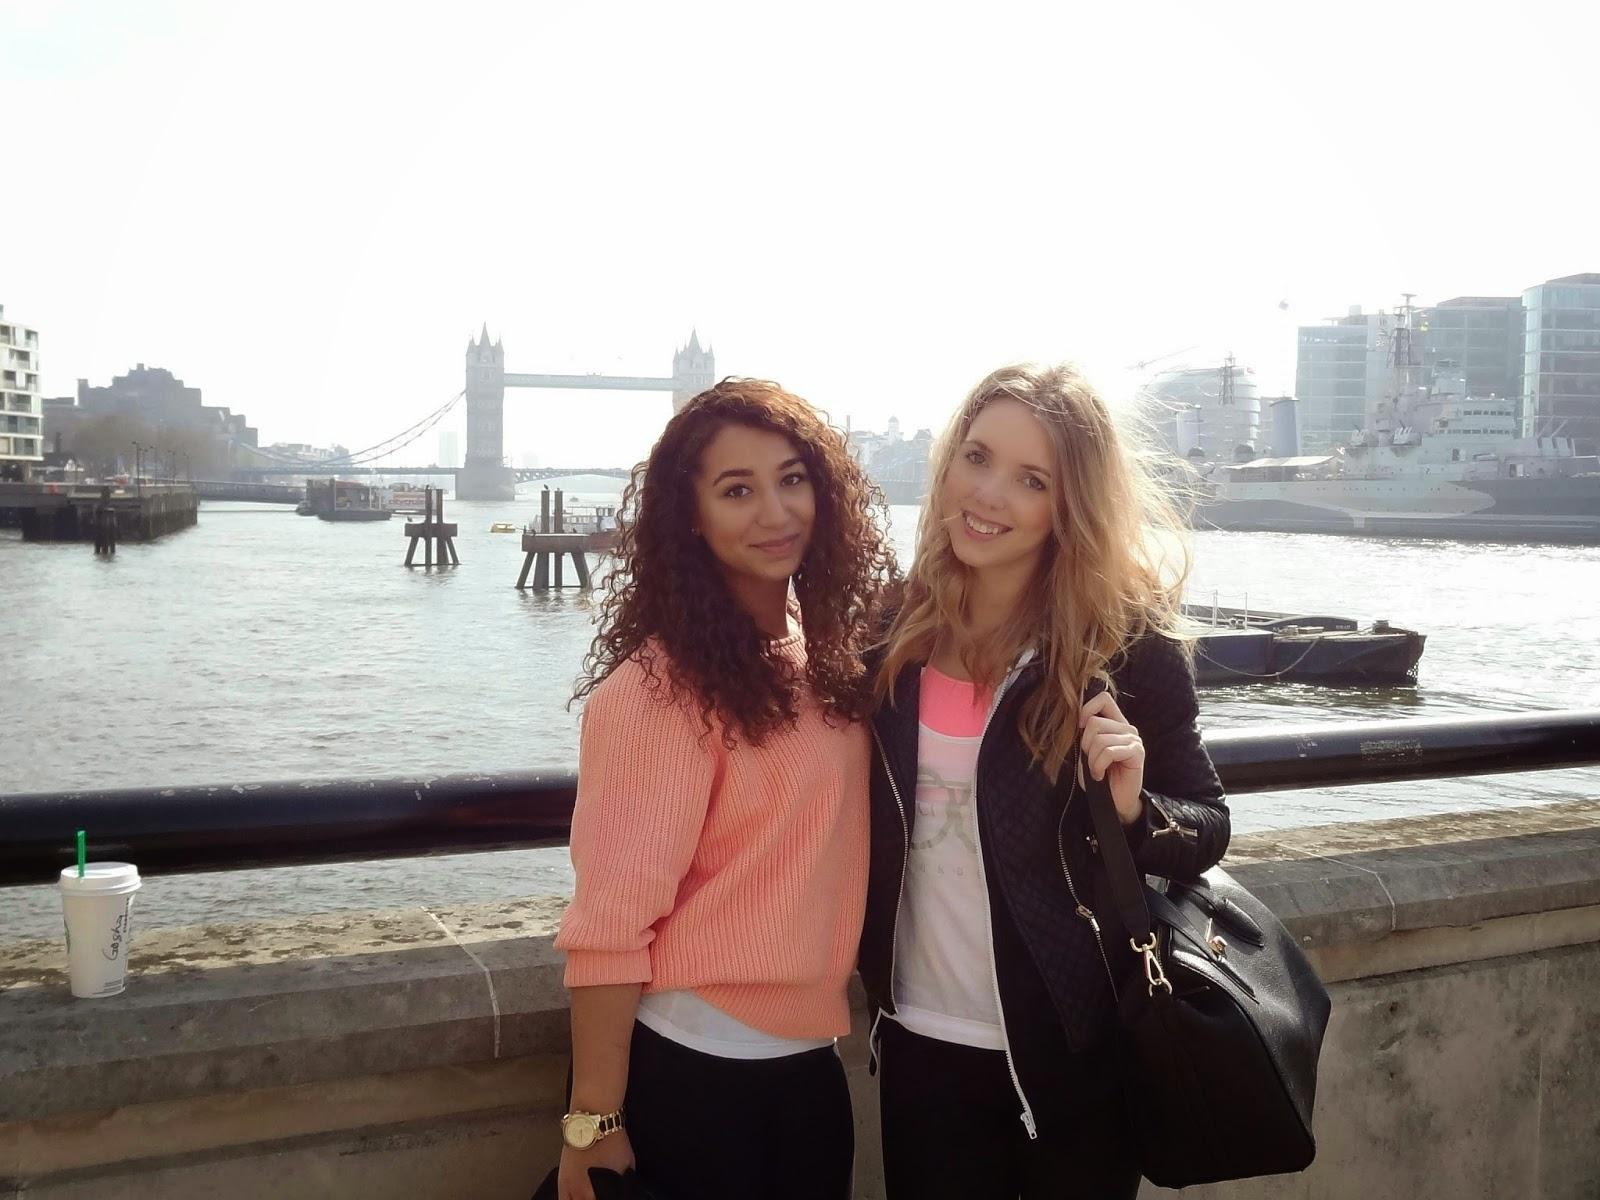 Cantara+Natalie+BeFitLondon+Crop.jpg